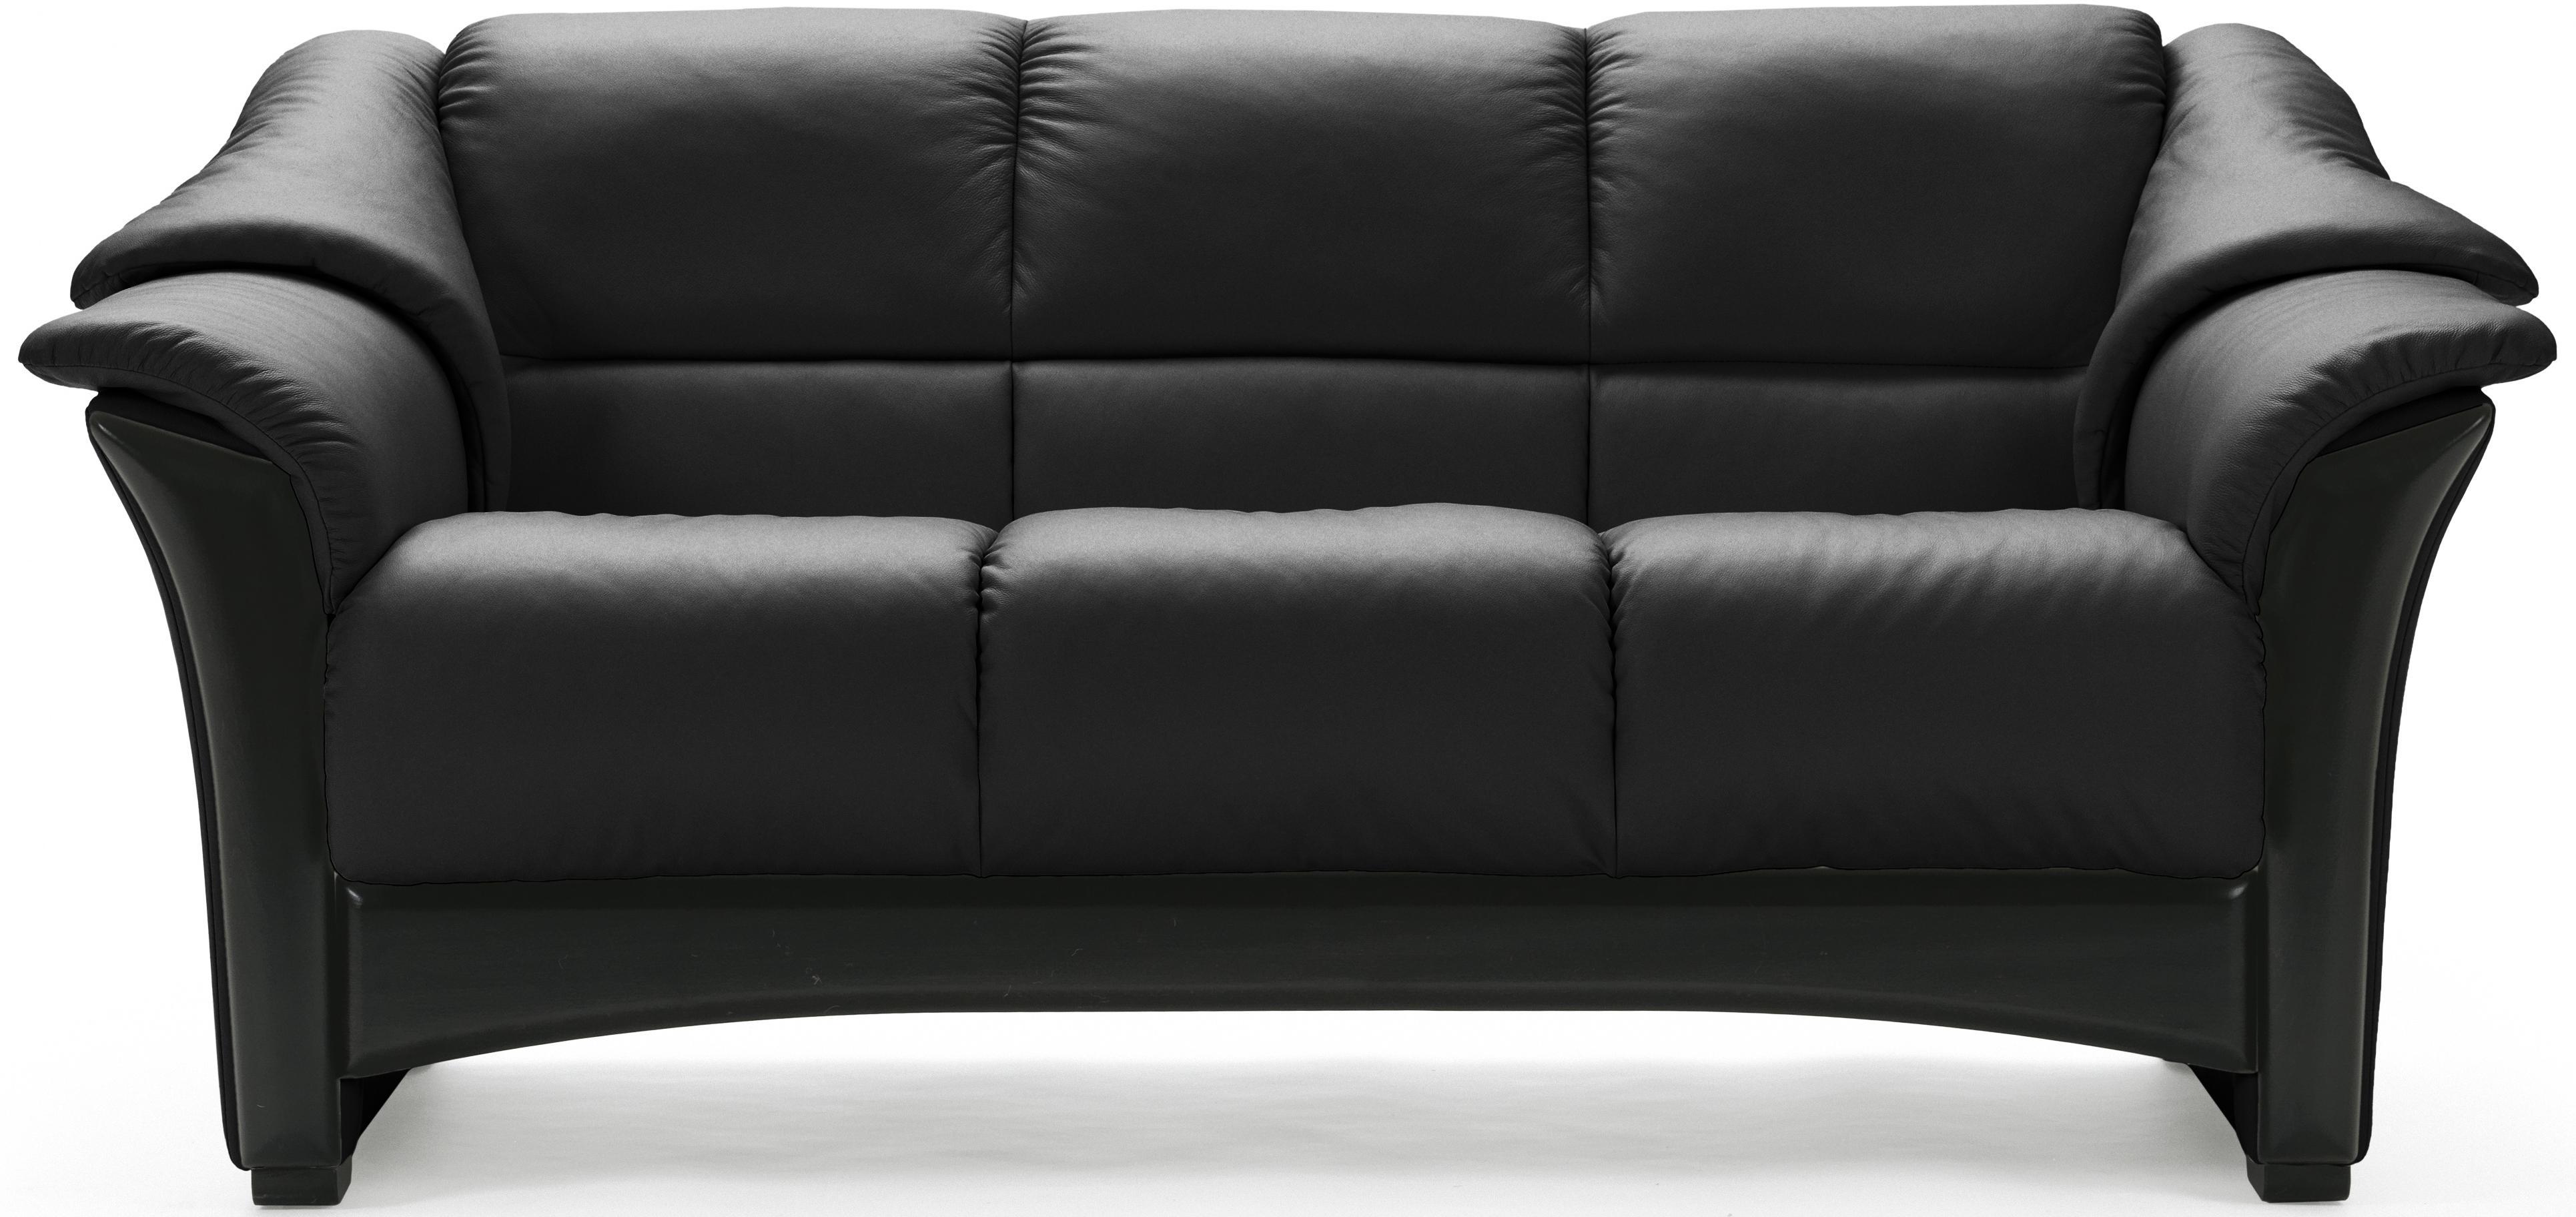 Stressless Oslo 3 Cushion Loveseat Bennett S Furniture And